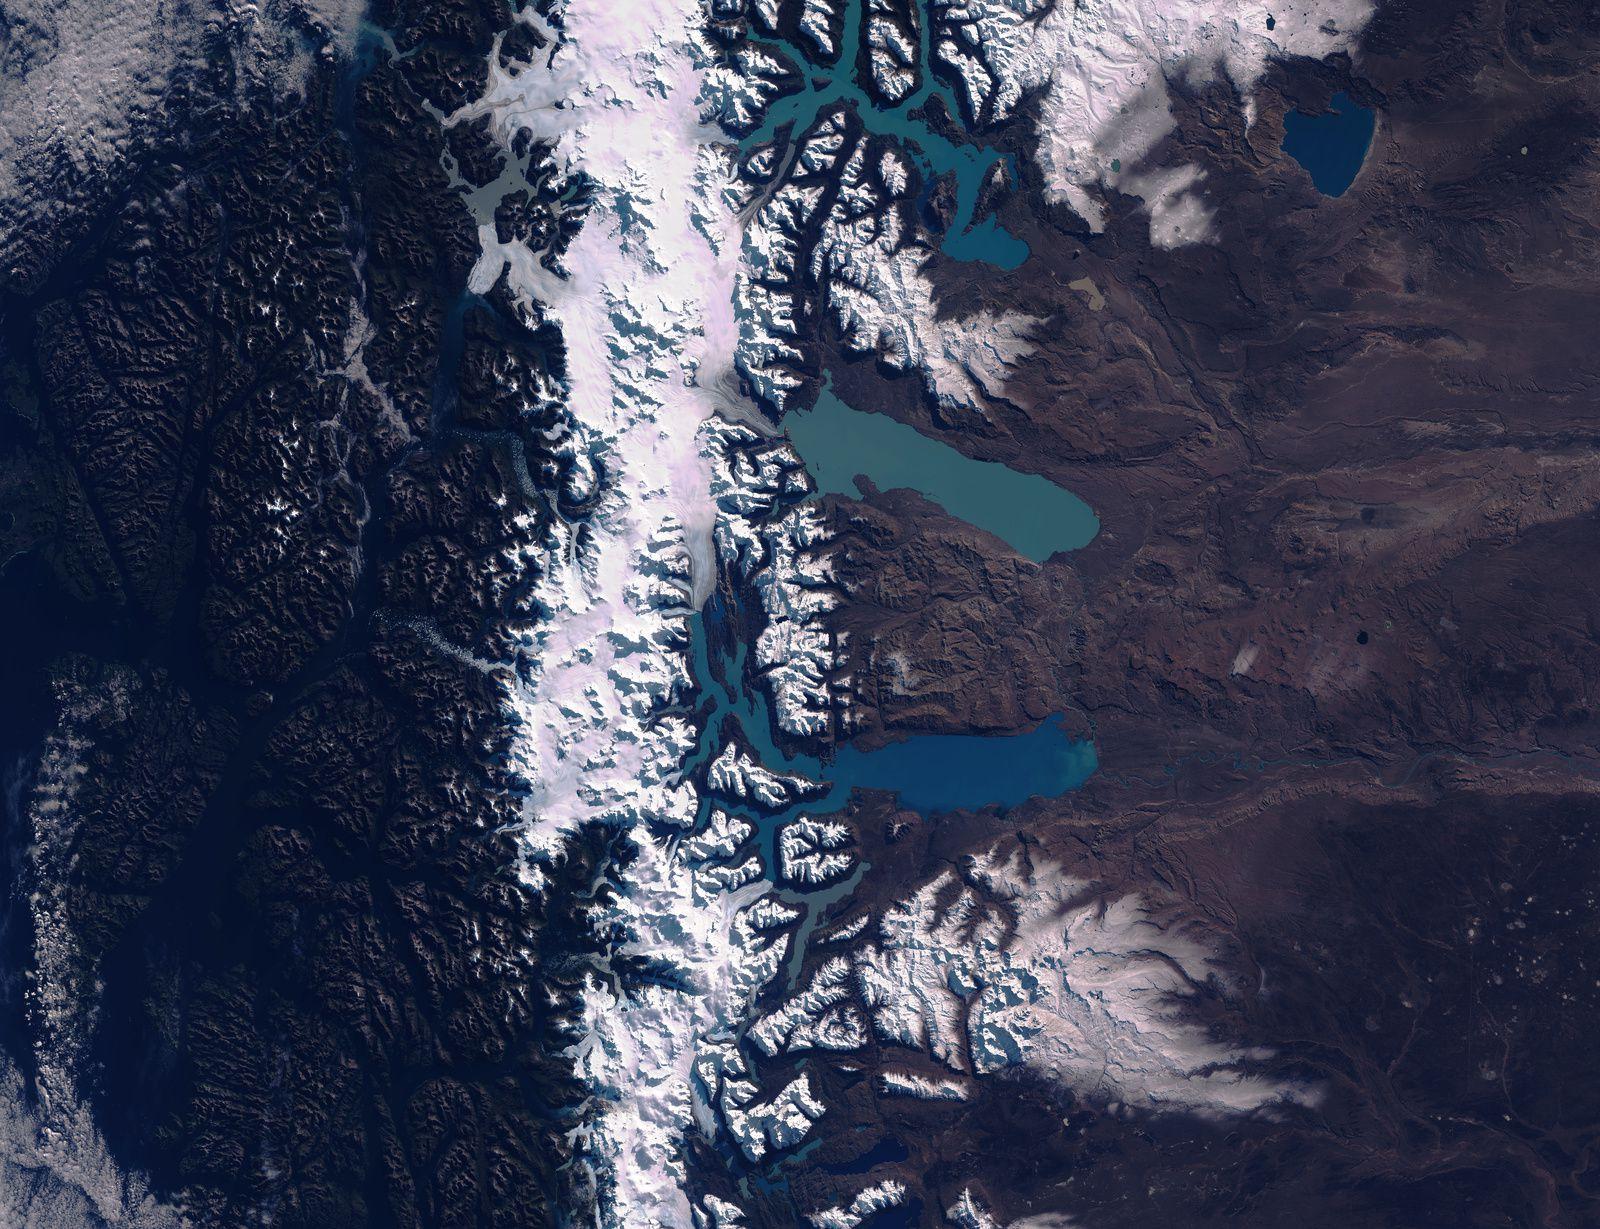 Sentinel-2 - Sentinel-2B - Copernicus - Argentine - Lago Viedma - Lago Argentino - 5 et 12 mai 2020 - Observation de la Terre